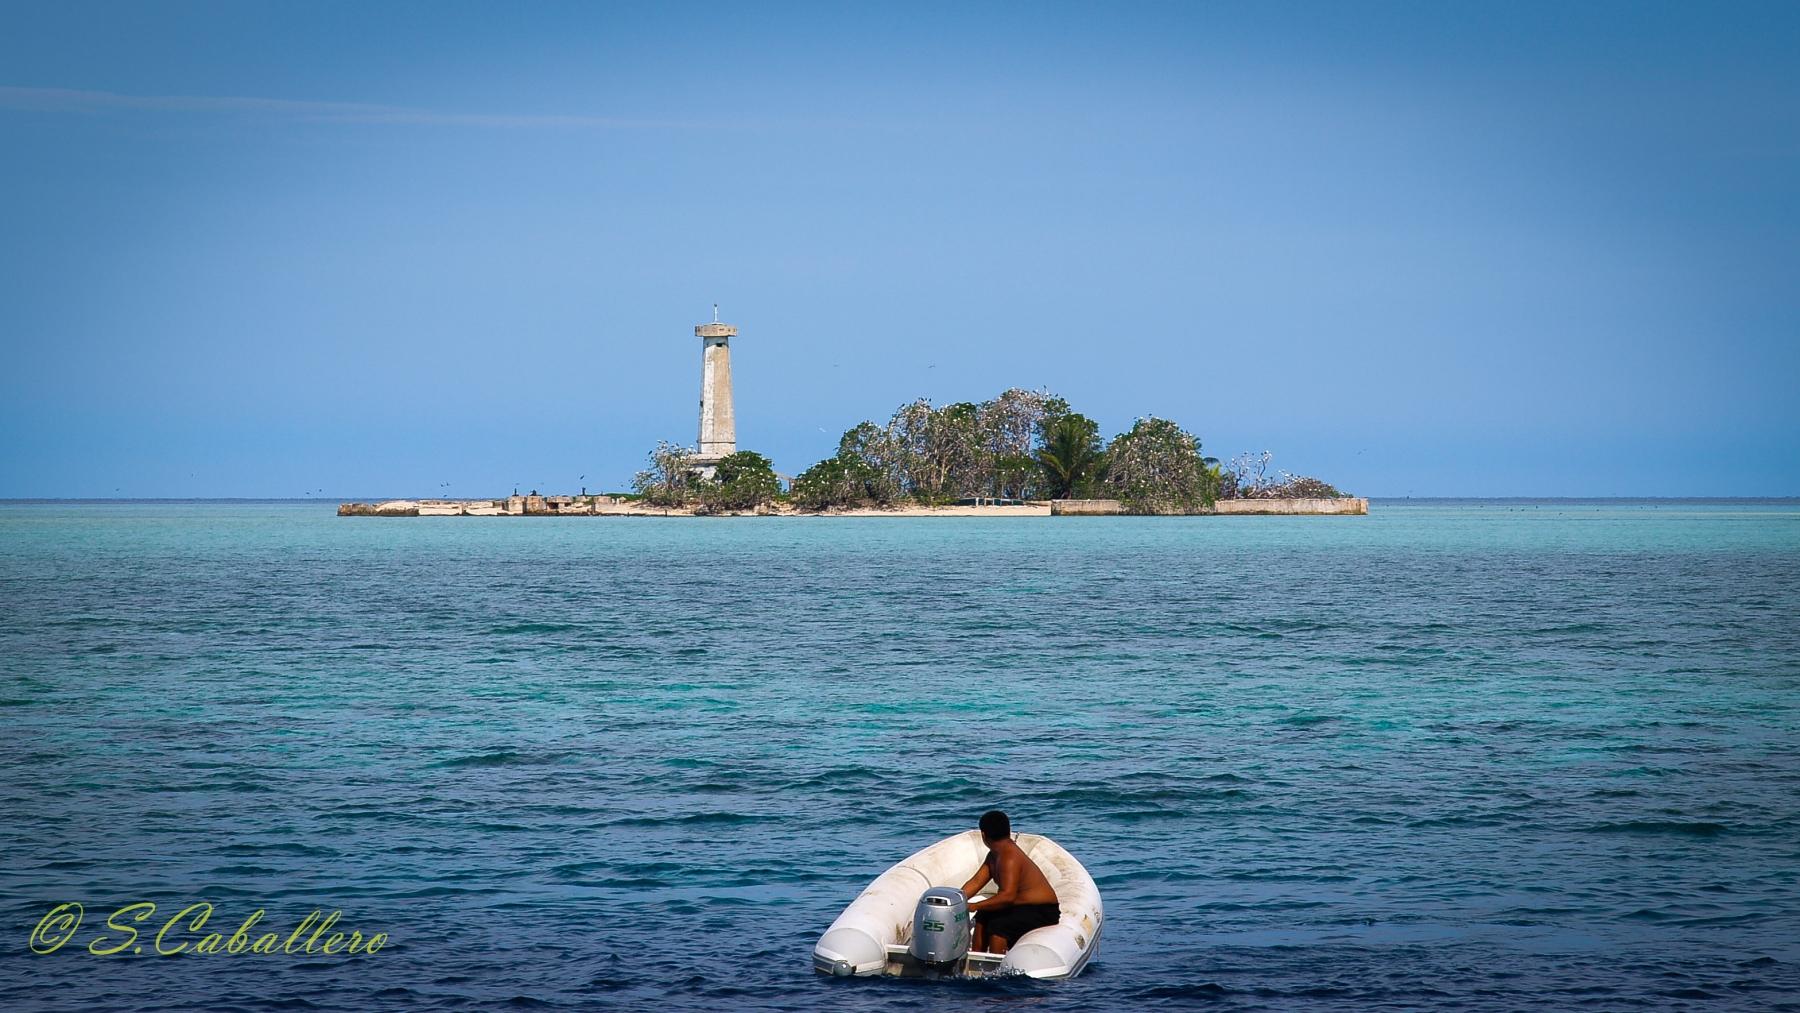 Tubbtaha-Reef Leuchtturm